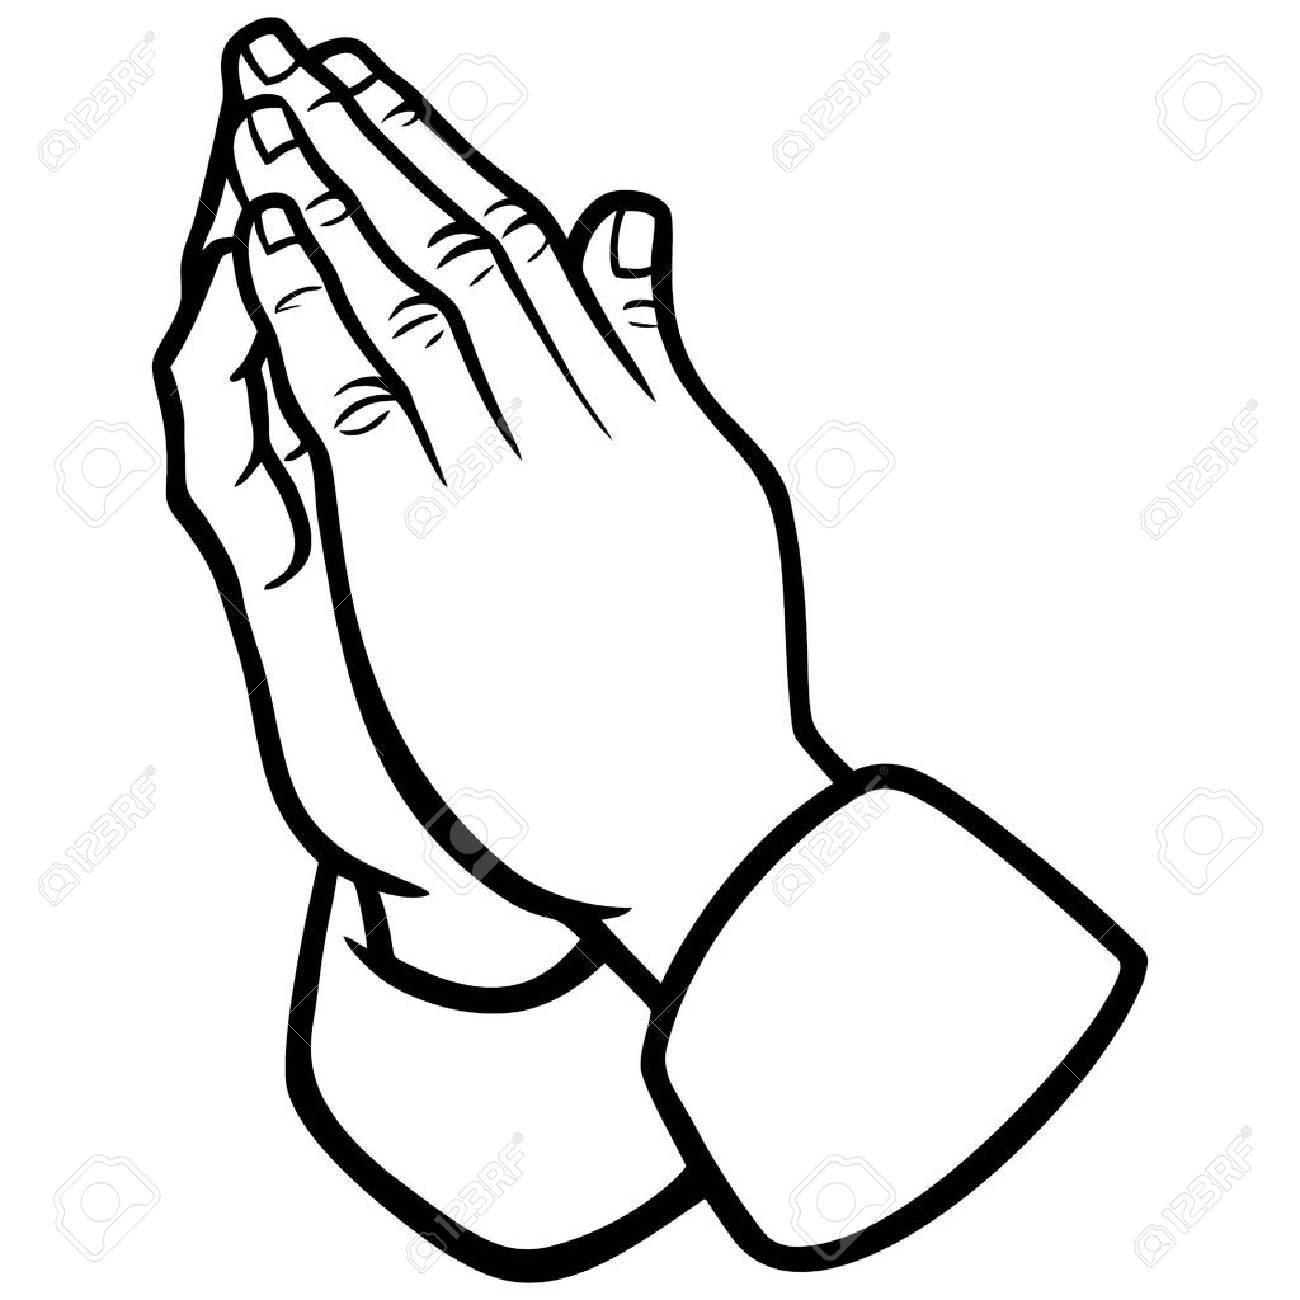 Praying Hands Drawing Tutorial At Getdrawings